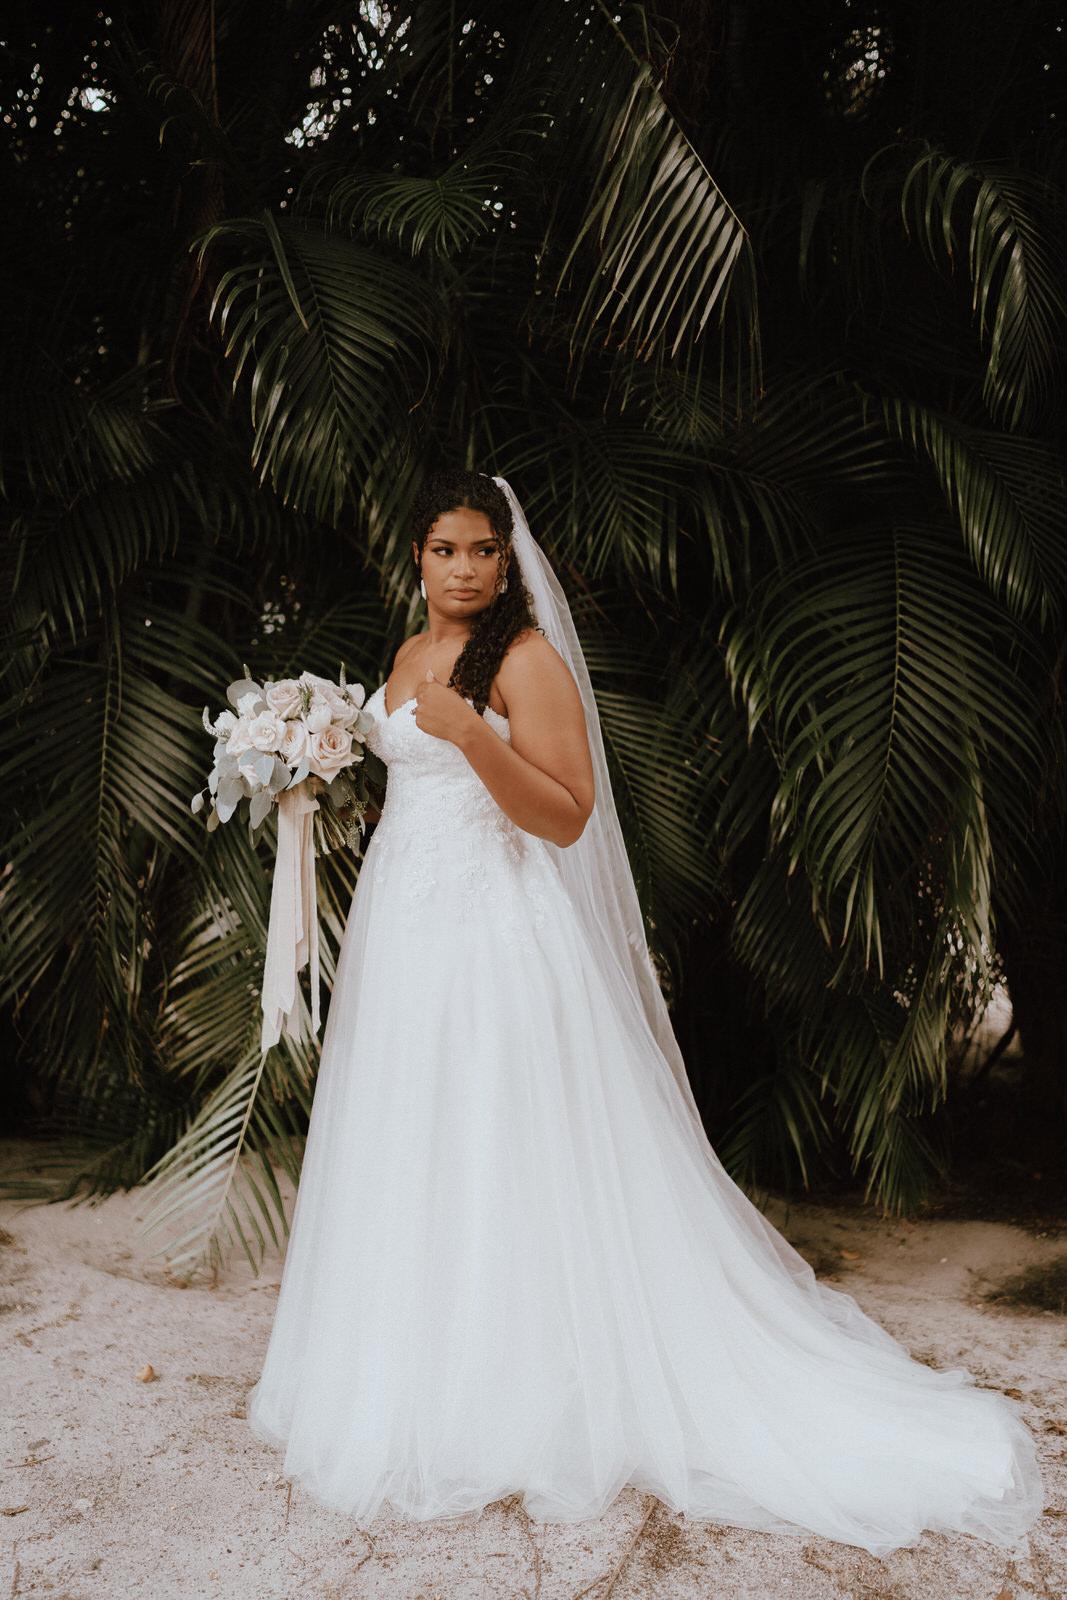 South Seas Island Resort Elopement- Alyana and Shawn- Michelle Gonzalez Photography-129.JPG